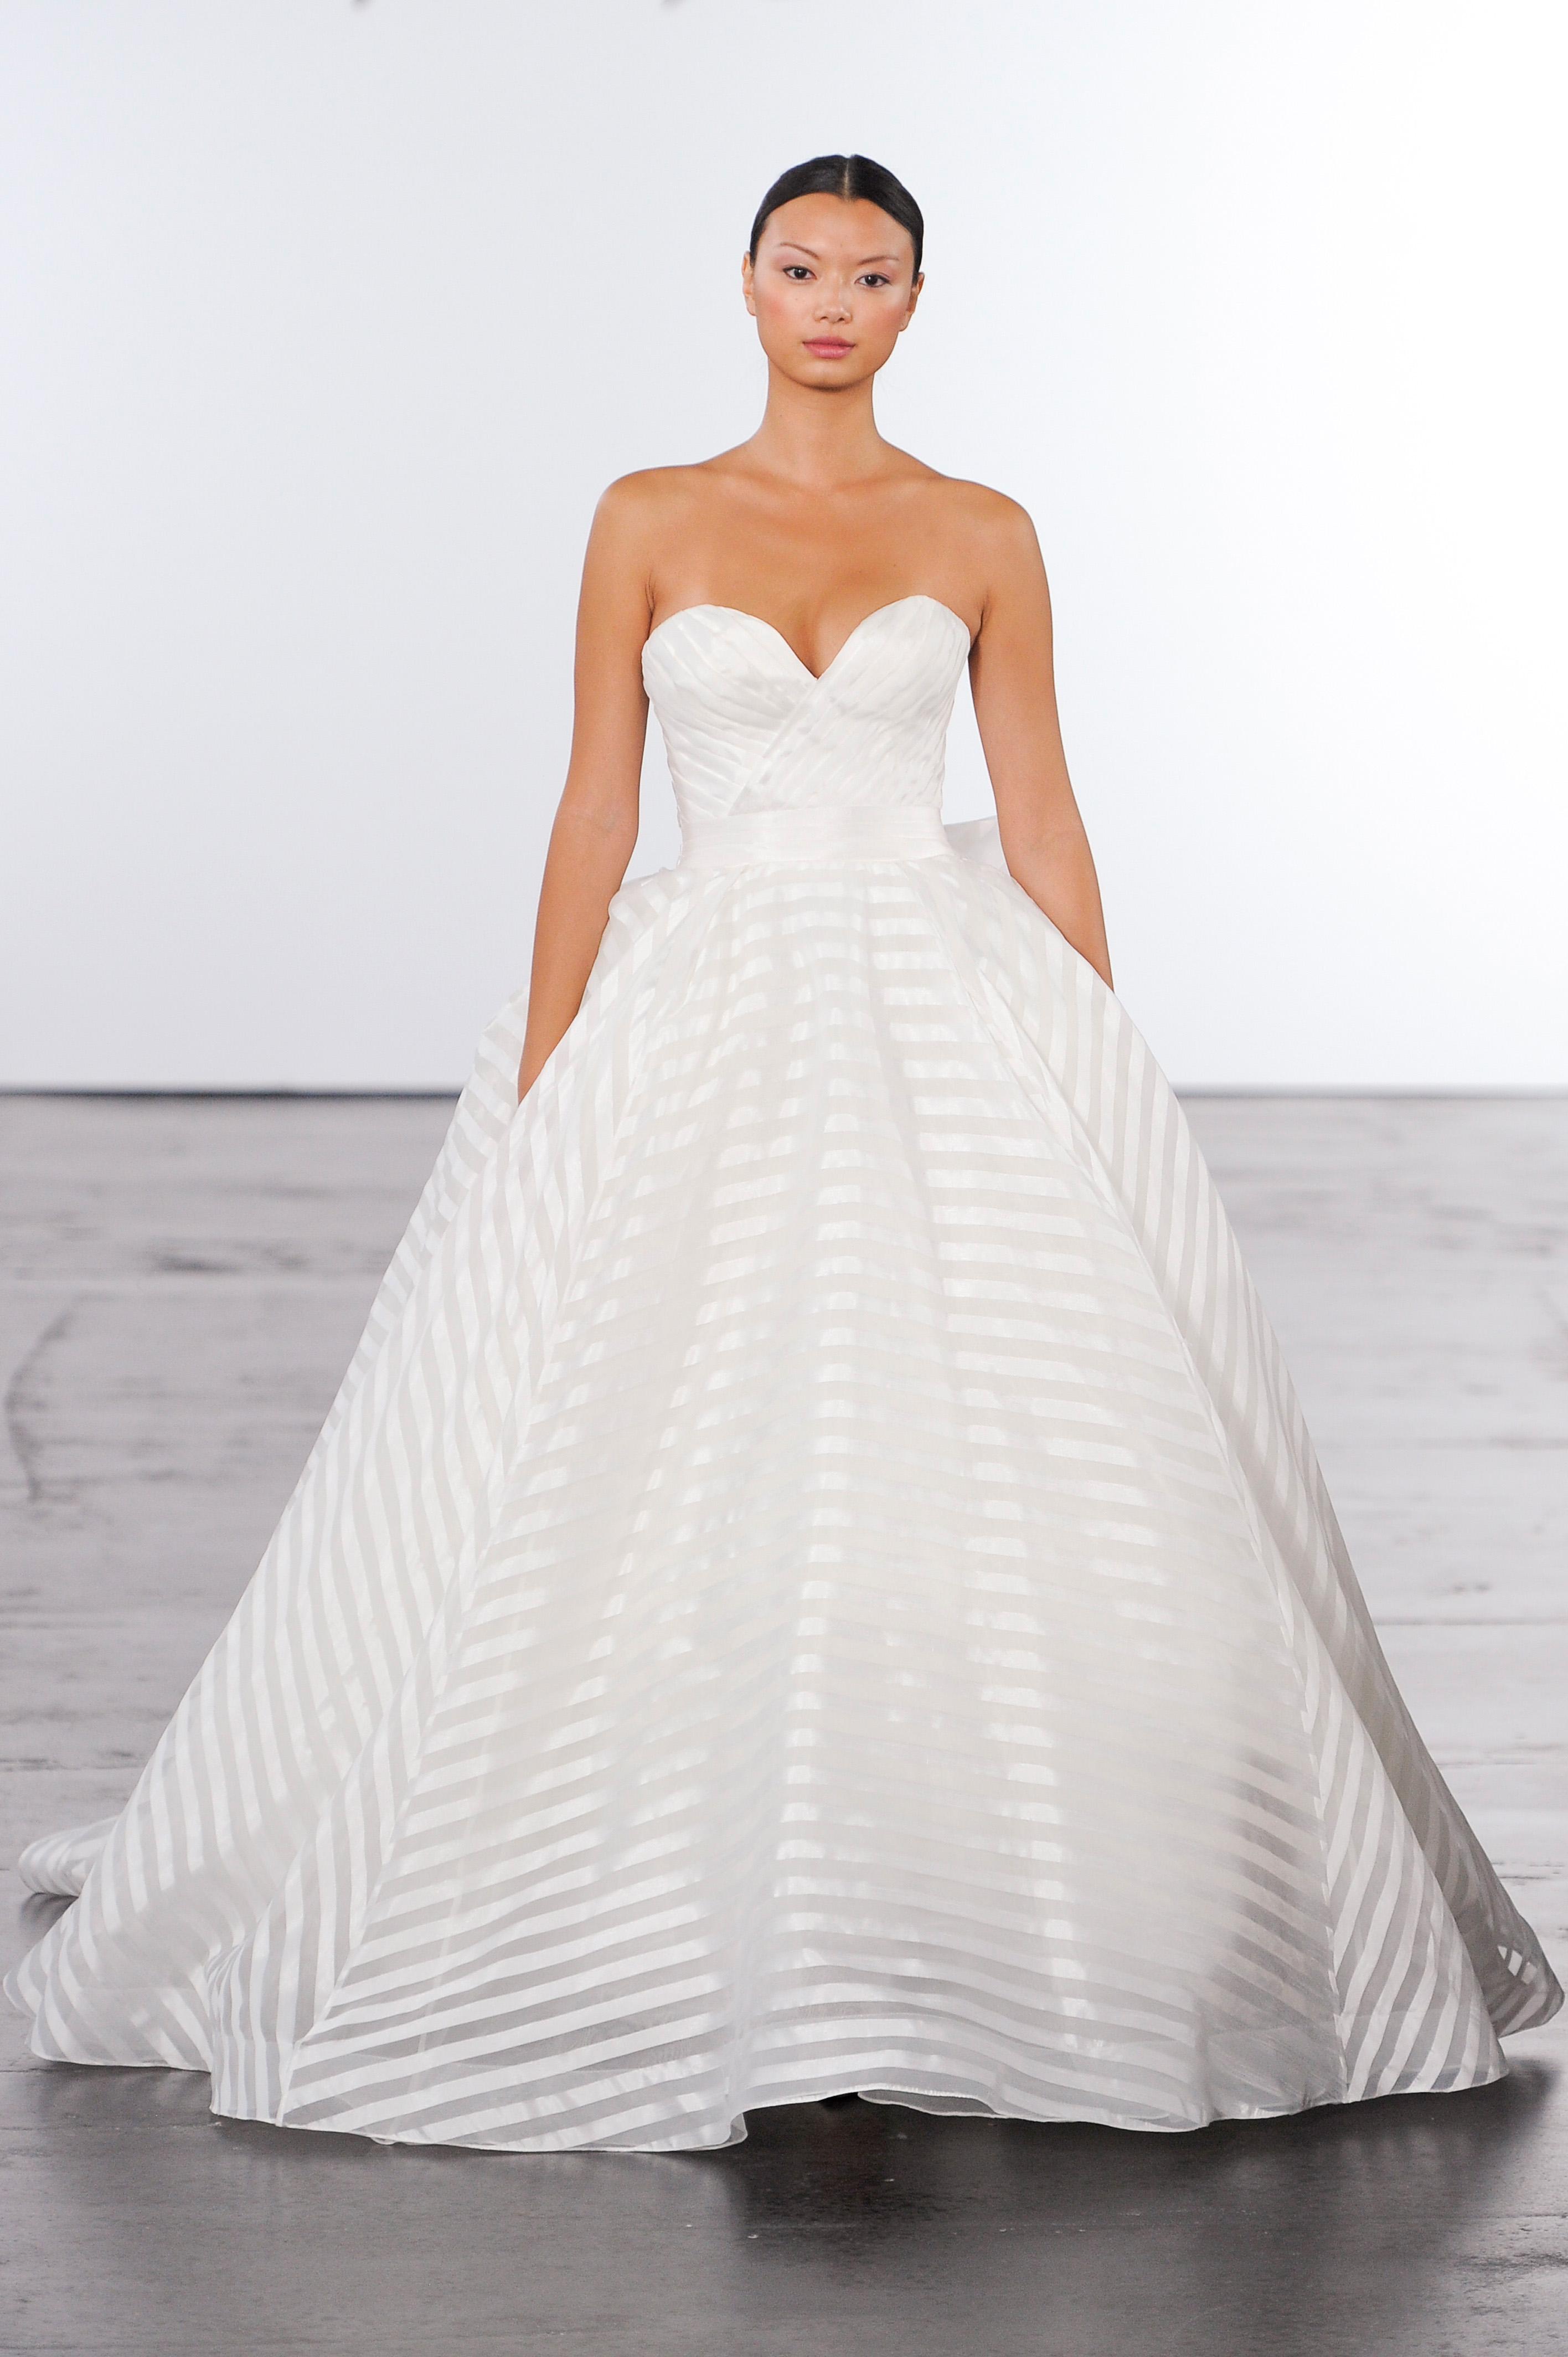 dennis basso sweetheart neckline wedding dress with stripes fall 2018